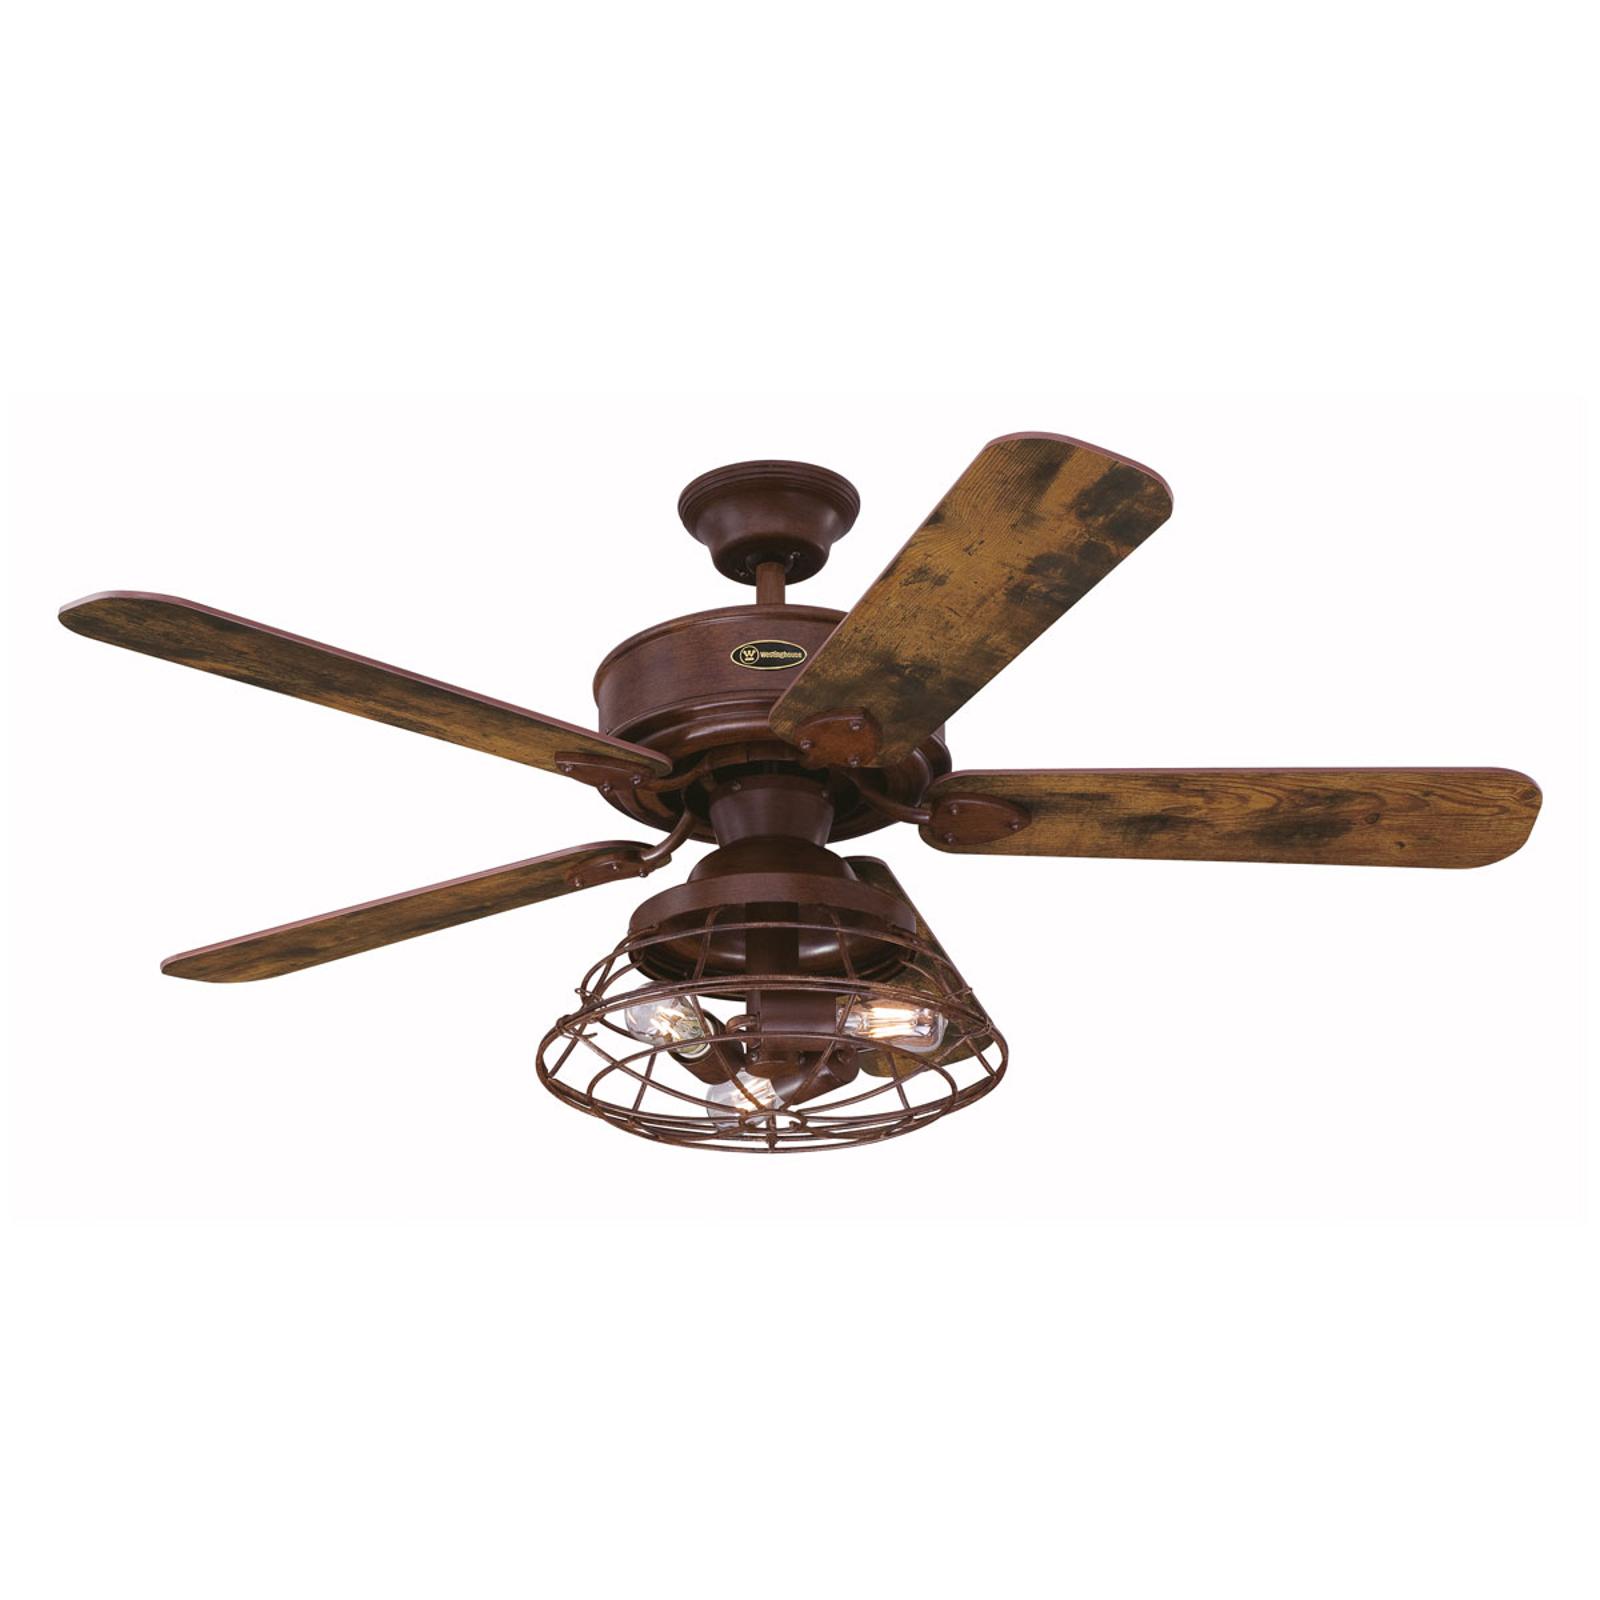 Westinghouse Barnett ventilador de techo, madera